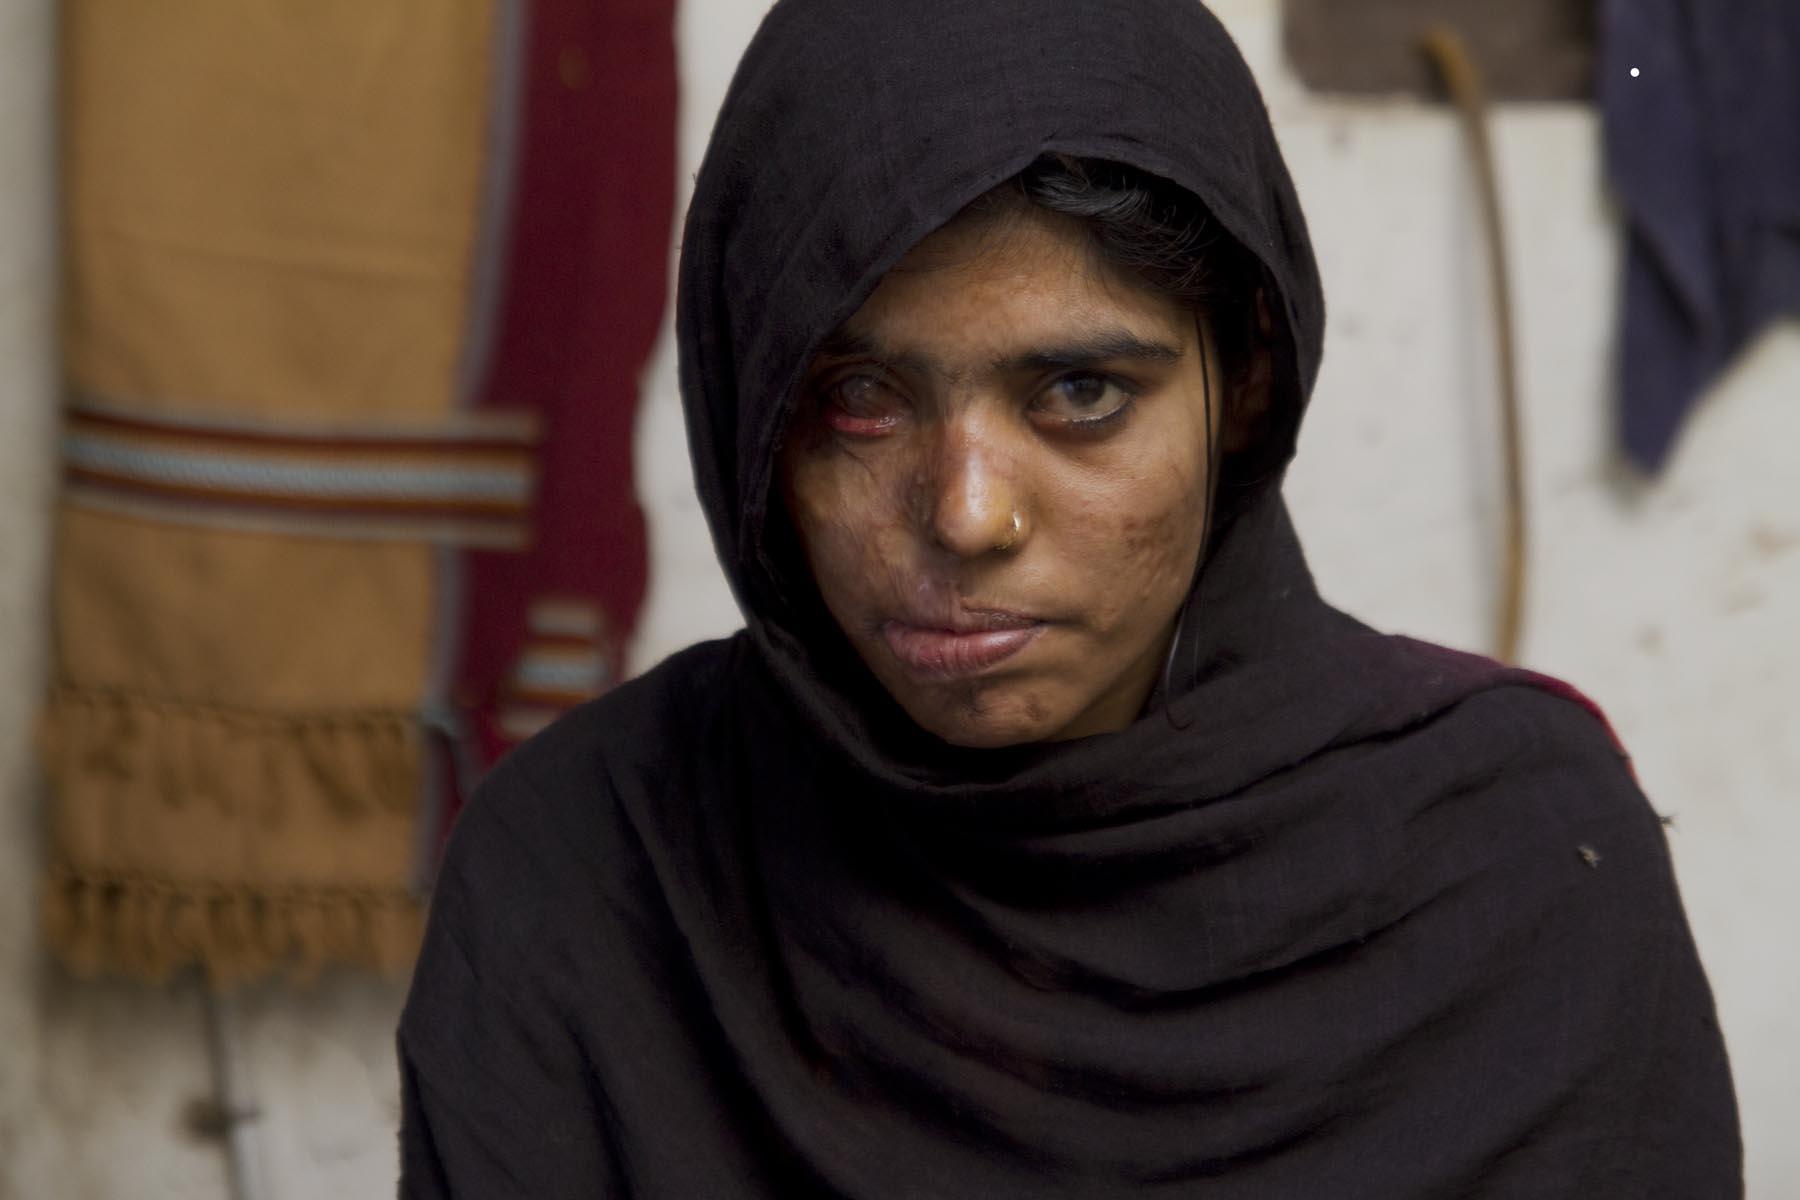 Saving Face - Sharmeen Obaid Chinoy & Daniel Junge (Pakistan)